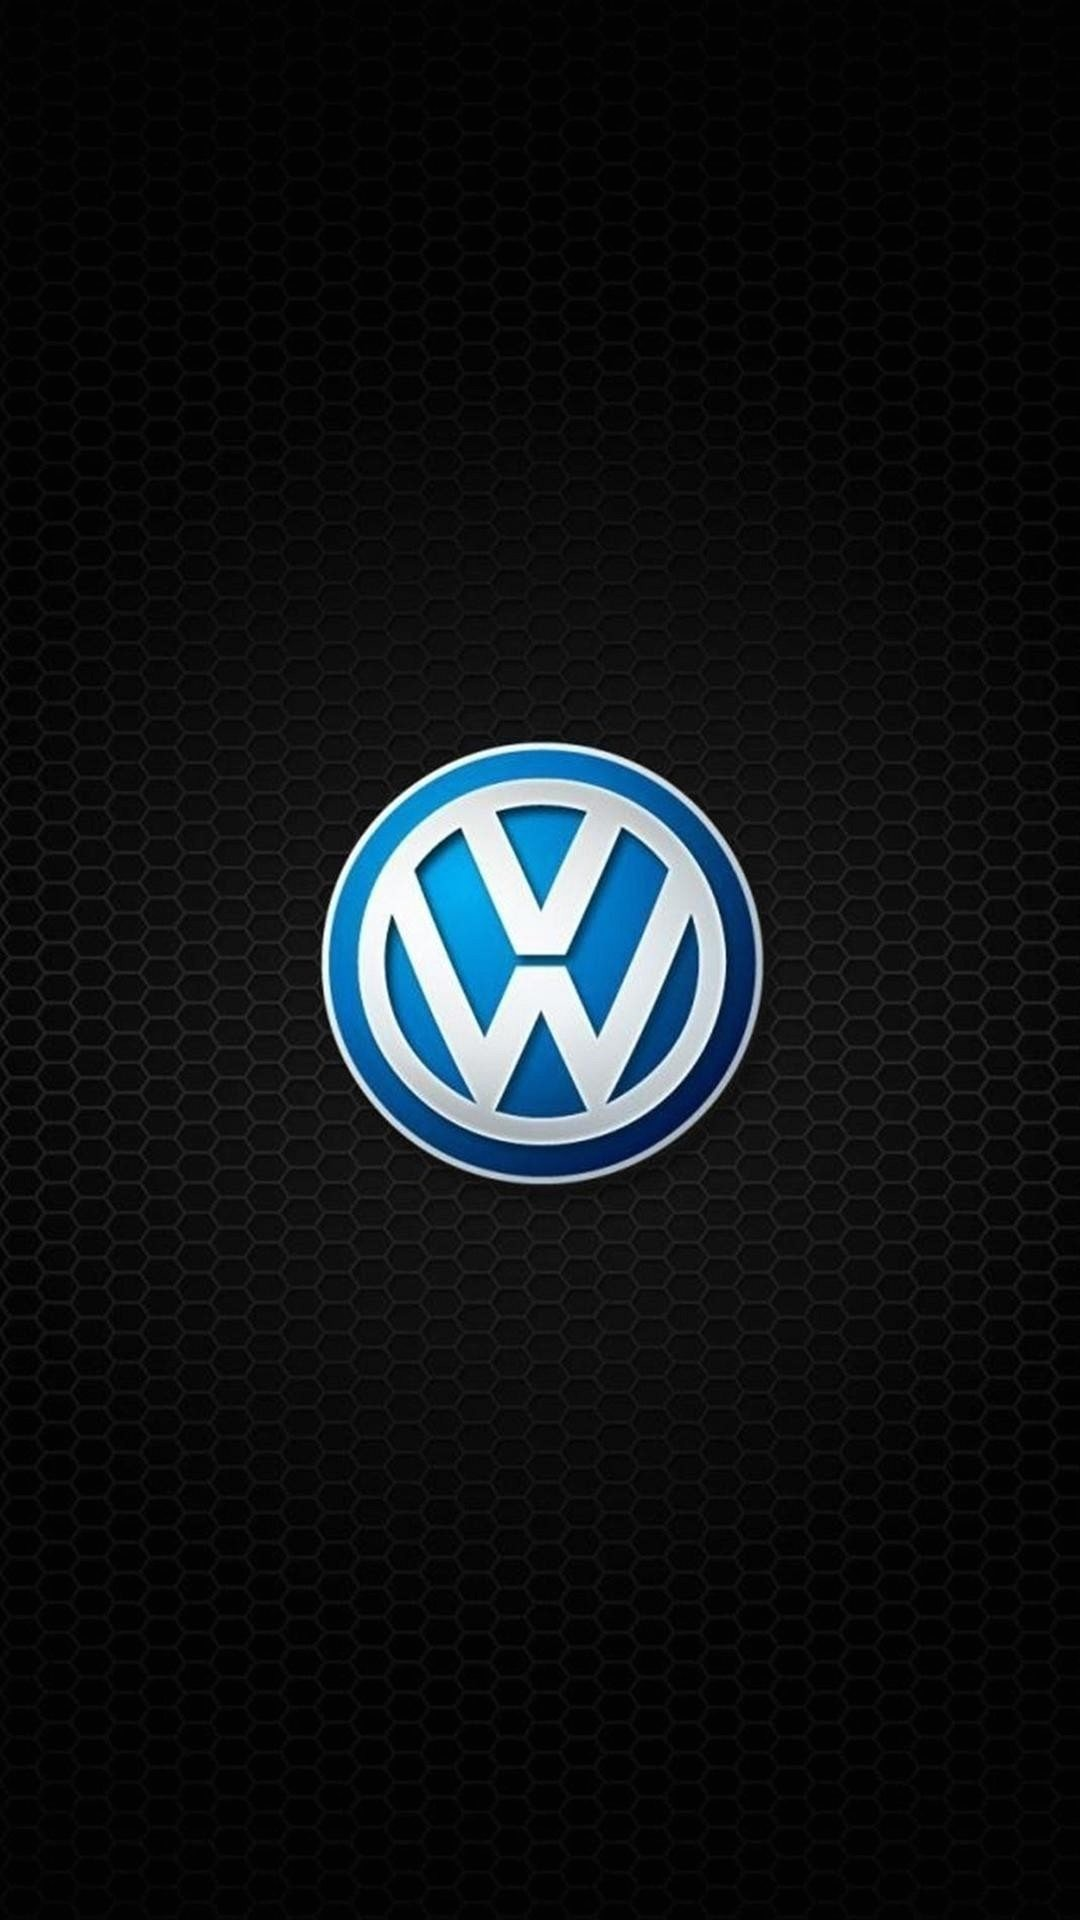 VW Logo Wallpaper 53 images 1080x1920